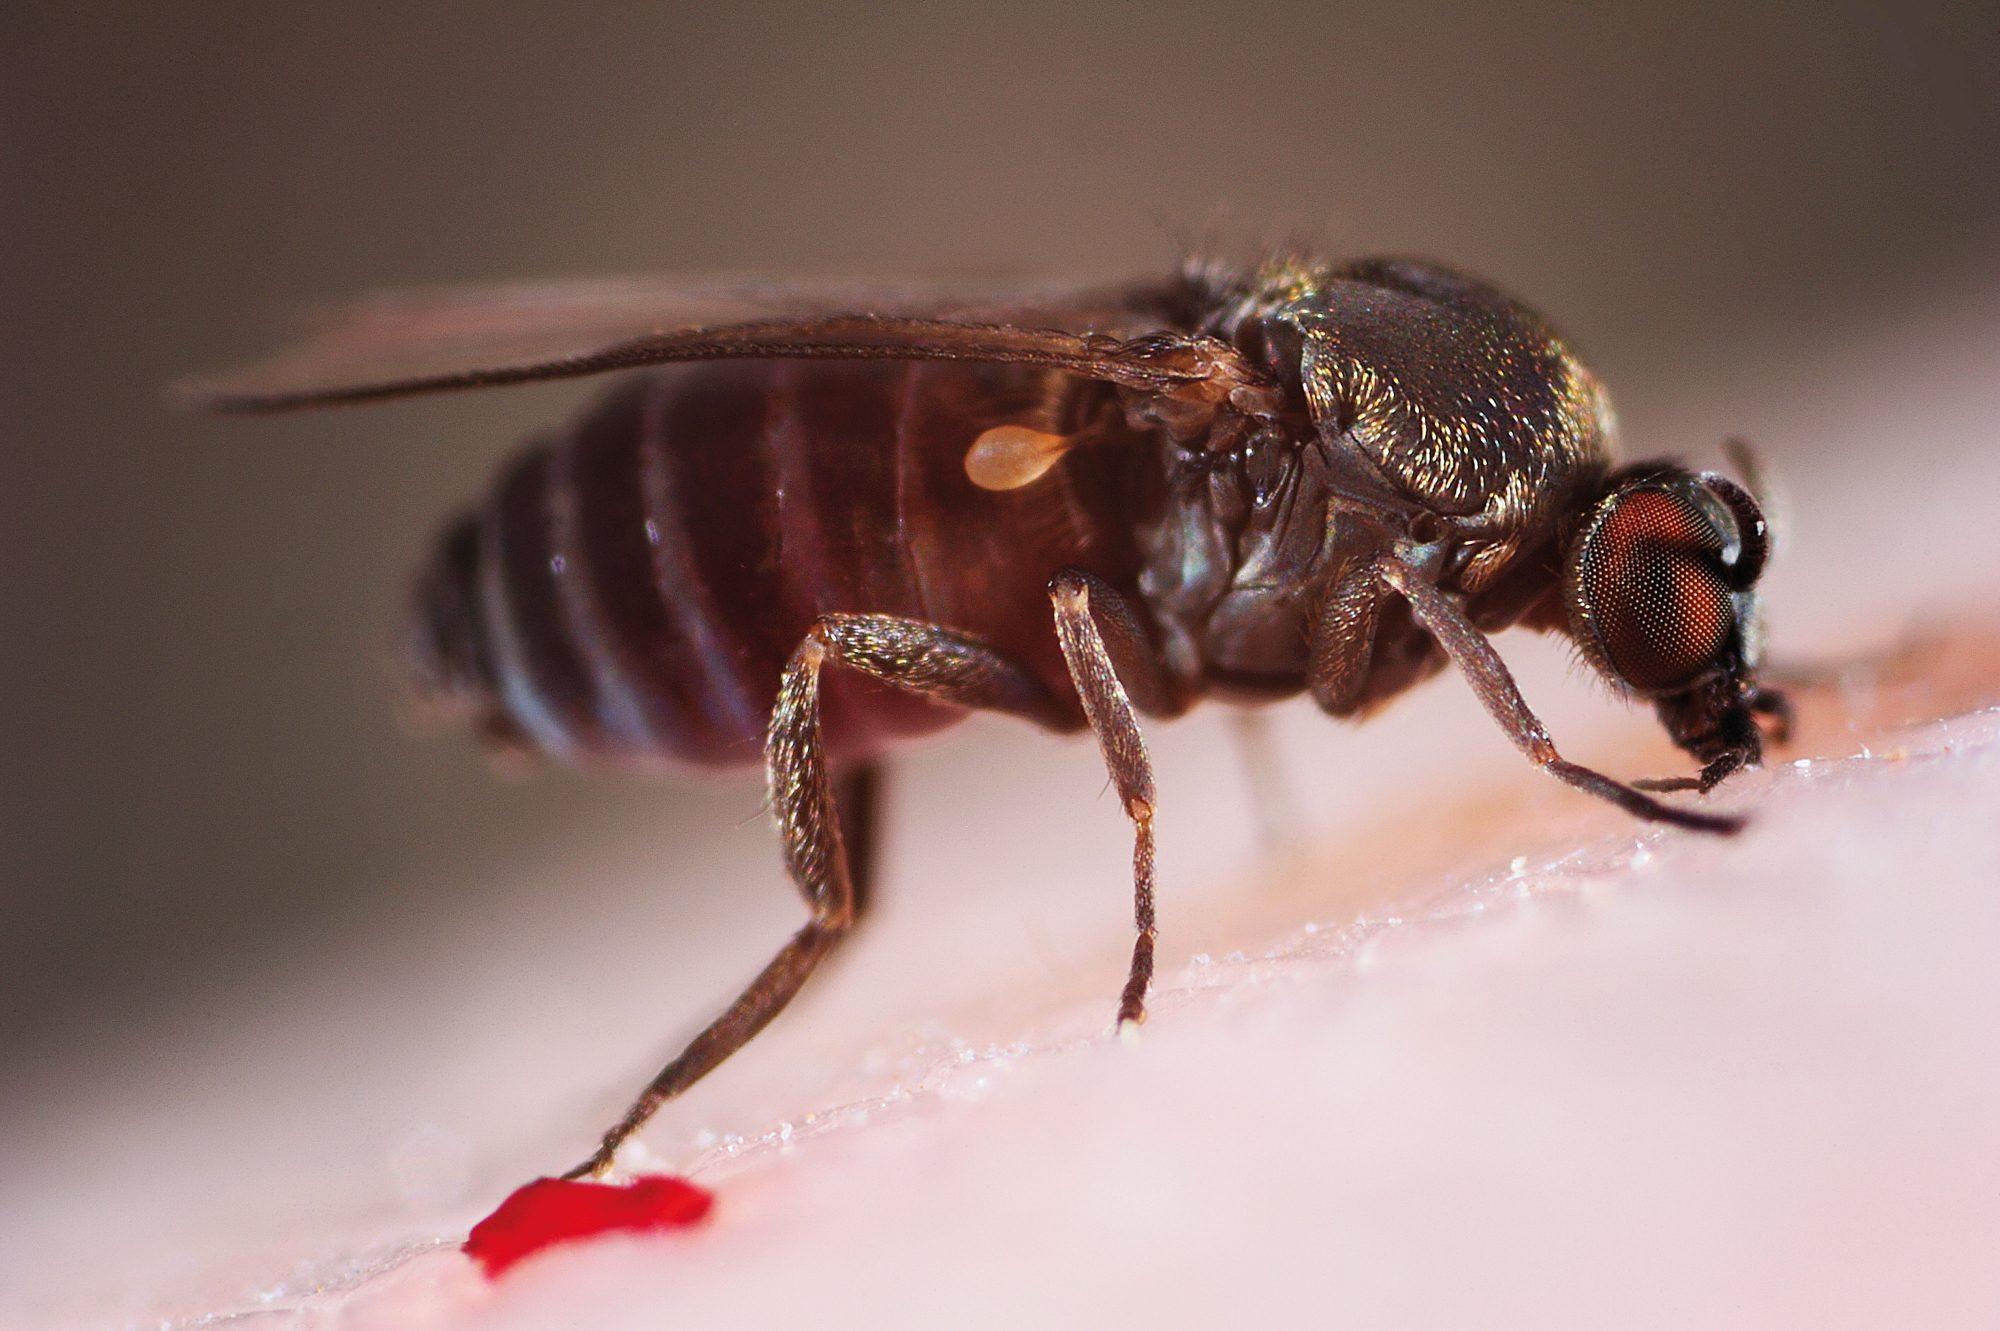 Sandfly Bites